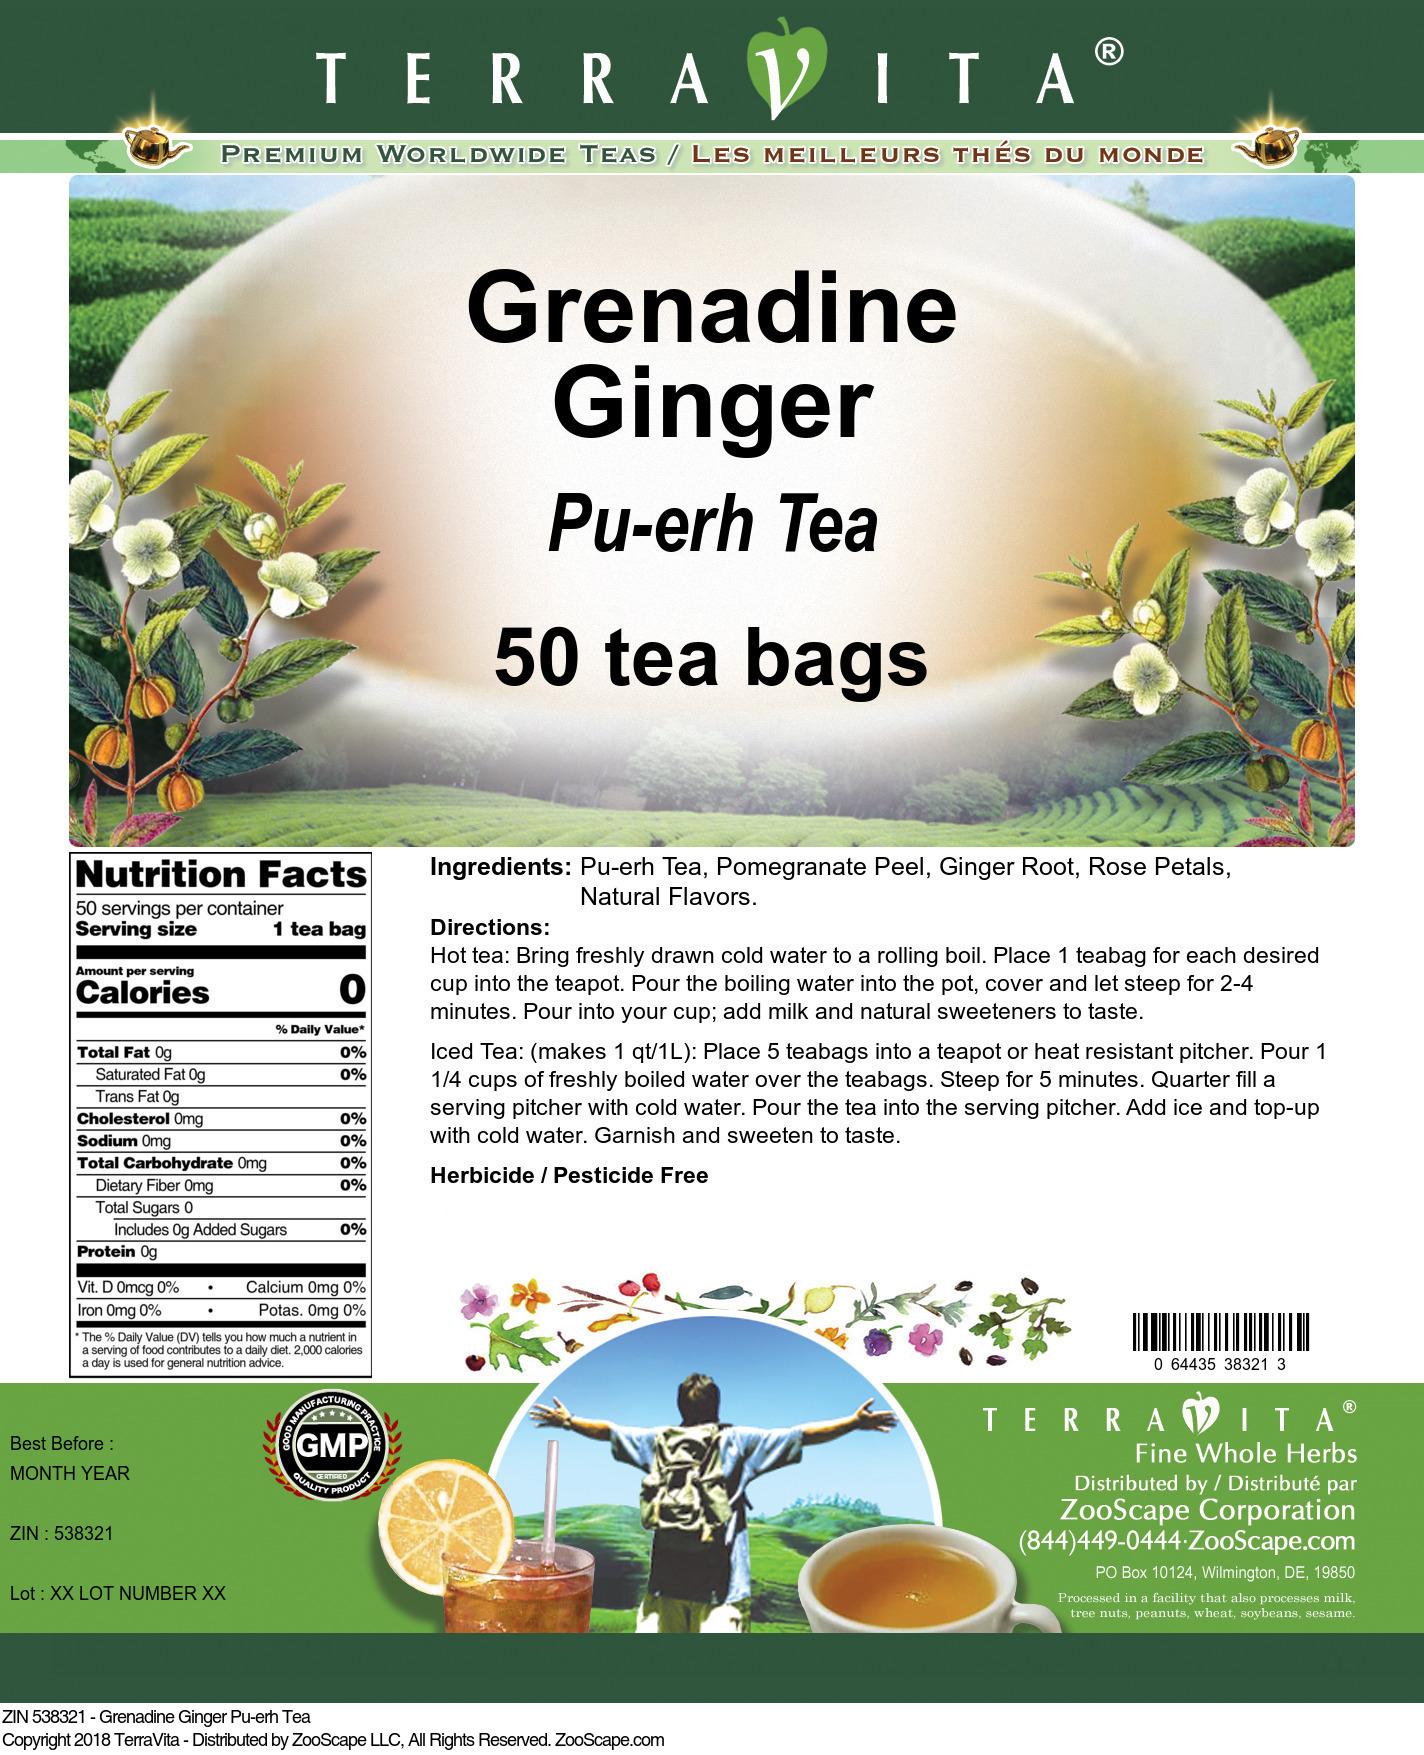 Grenadine Ginger Pu-erh Tea